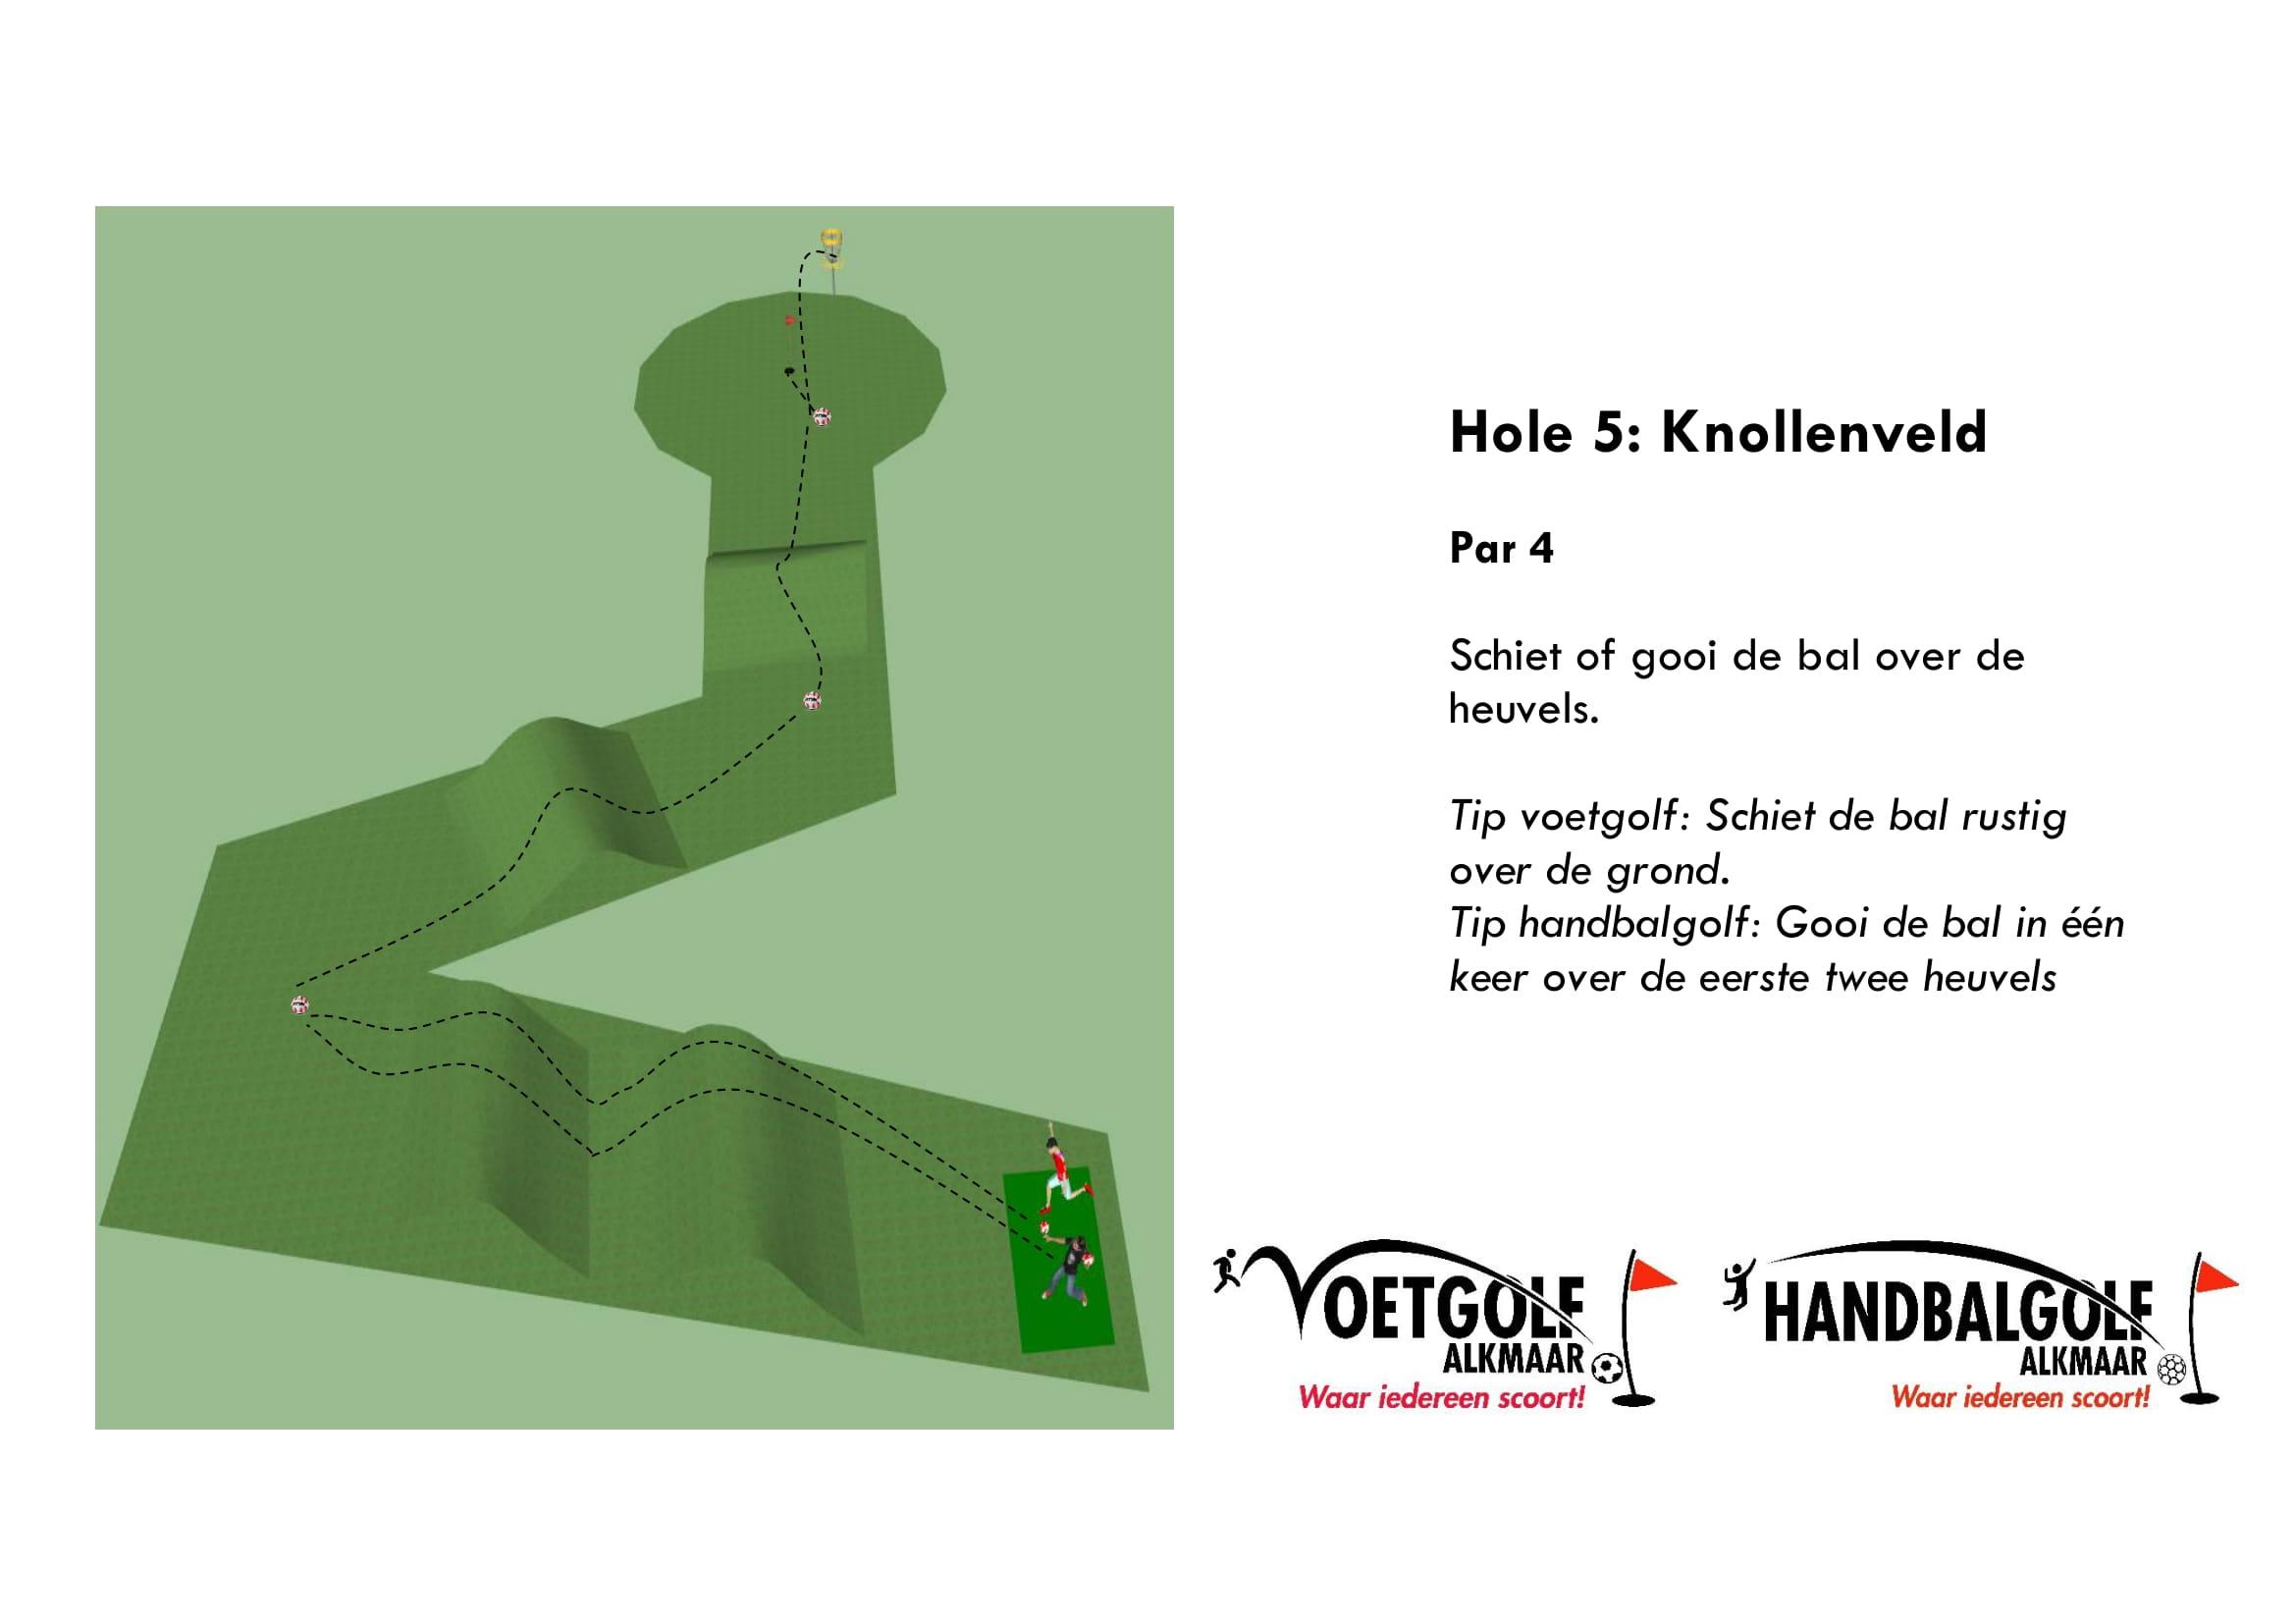 hole 5 met handbal